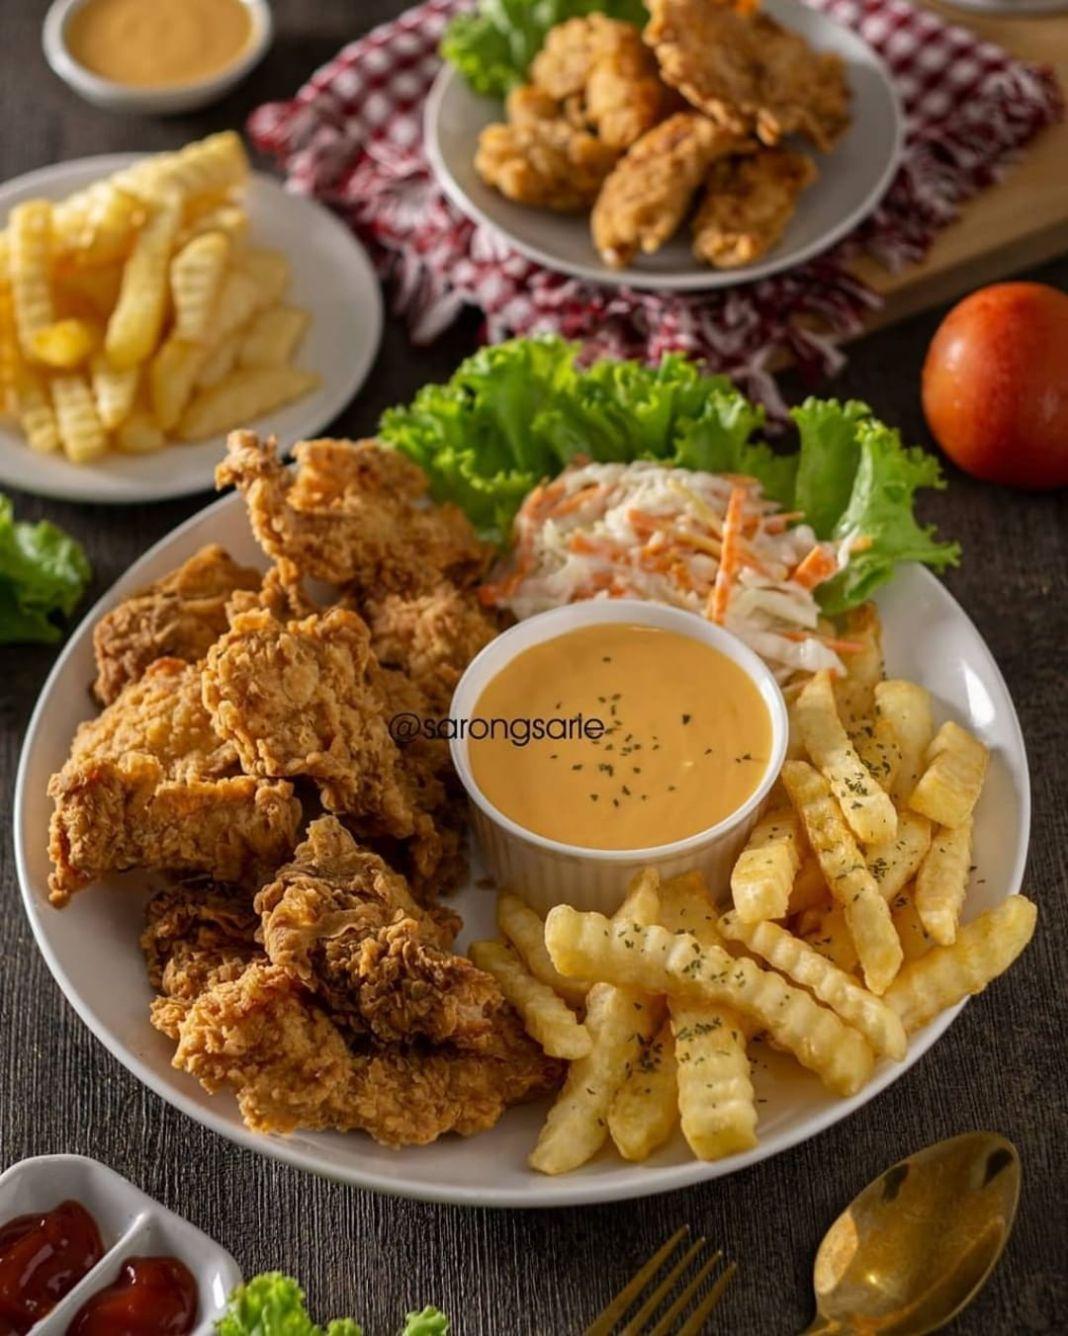 Info kuliner, ayam fillet crispy nya enak bgt kranchy serta dapat keriting tepungnya  Yuk save resepnya bwat mas…